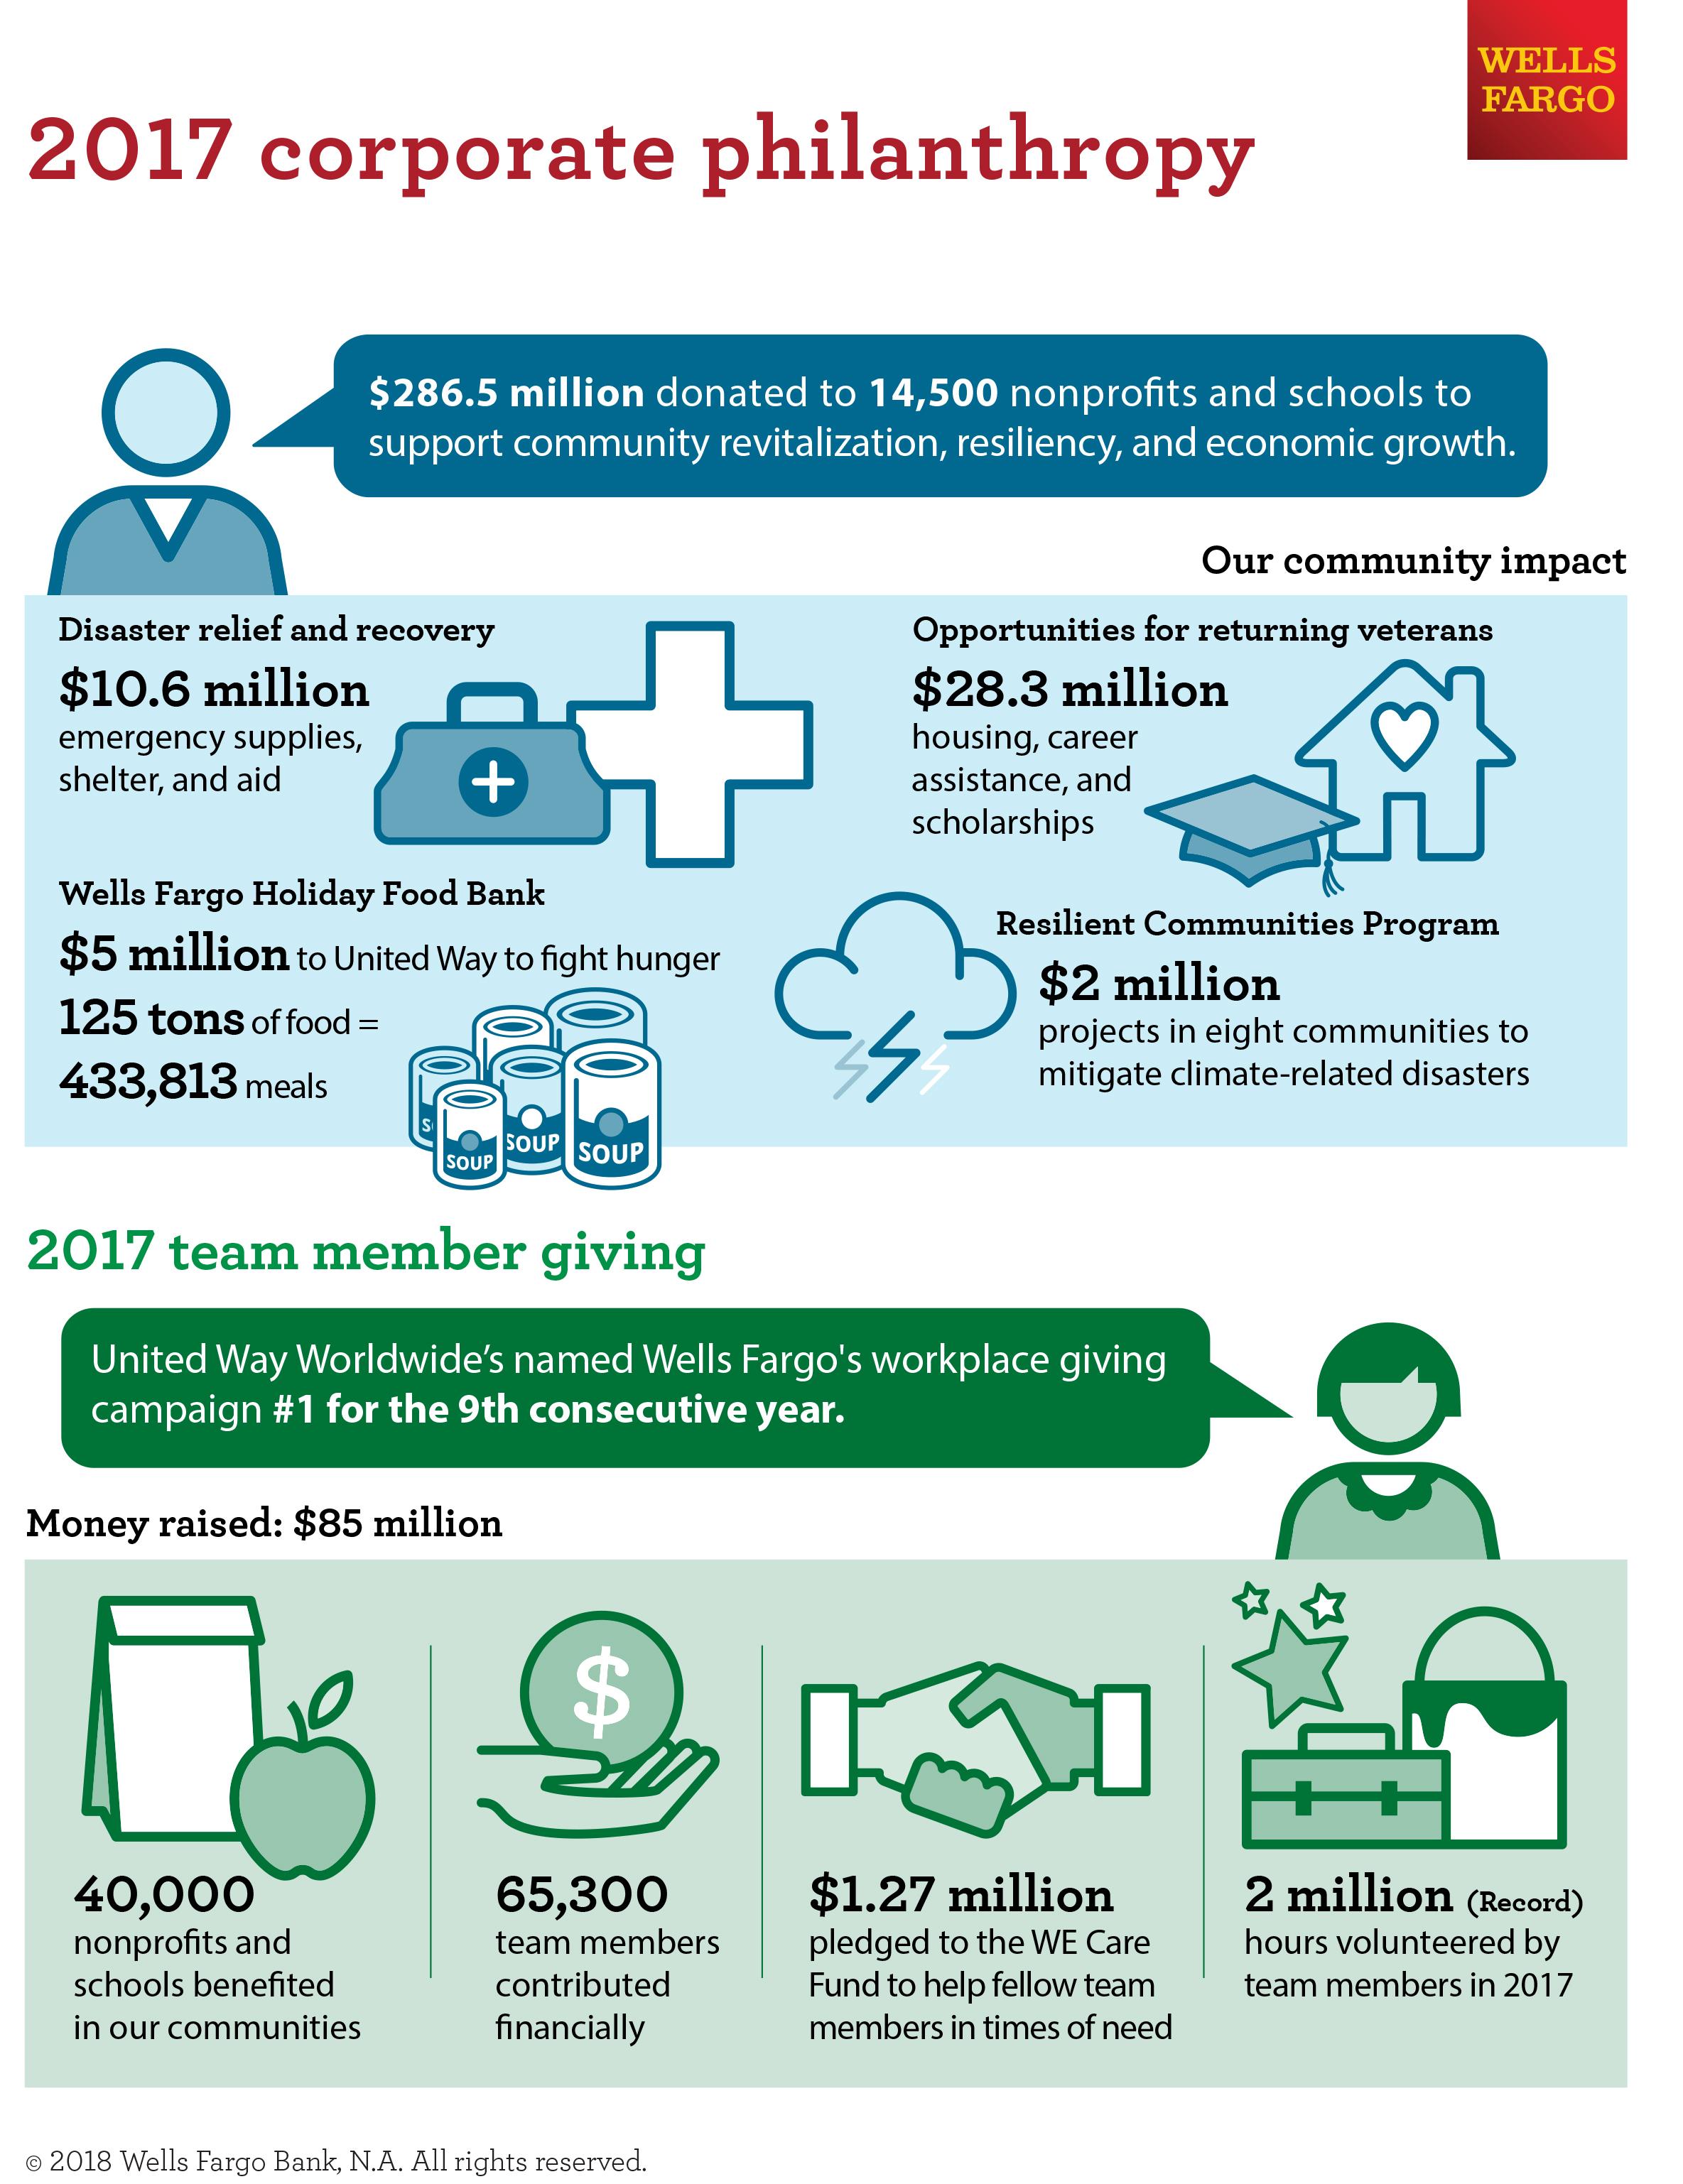 Wells Fargo's Corporate Philanthropy Totals $286 5 Million for 2017